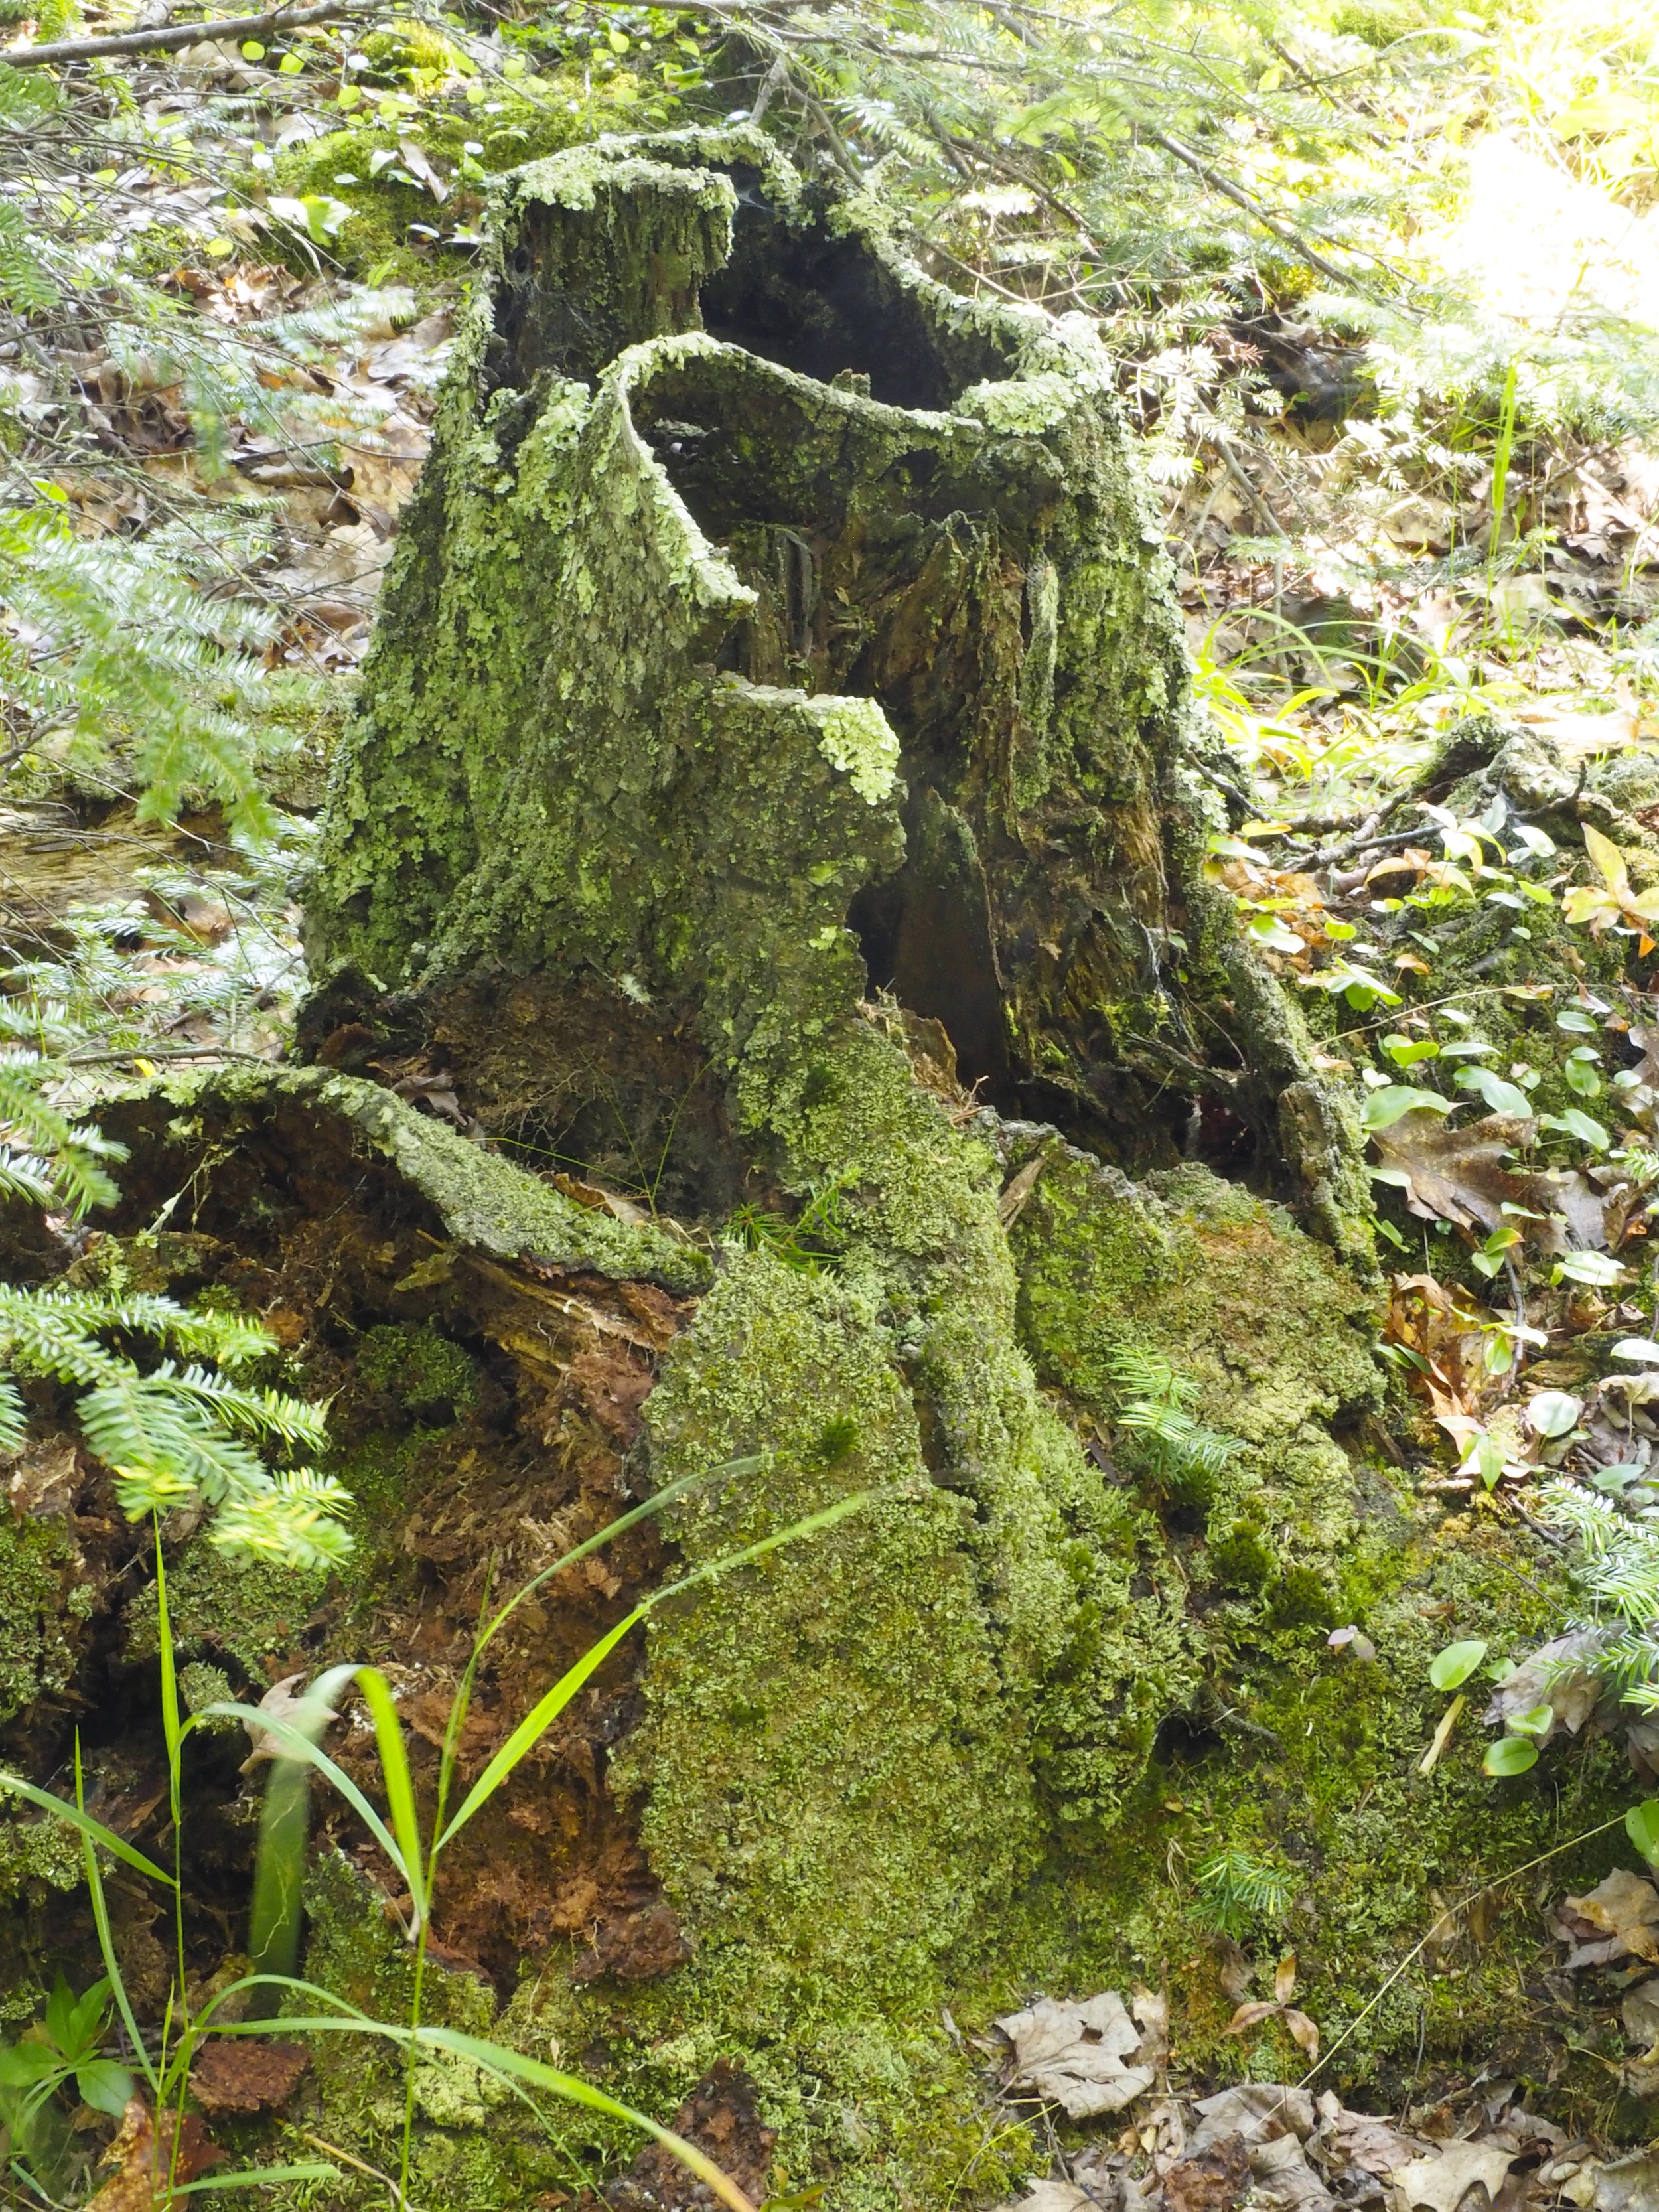 cindi_Madeline_NationalForest_Bog_spiritedtable_photo01.jpg